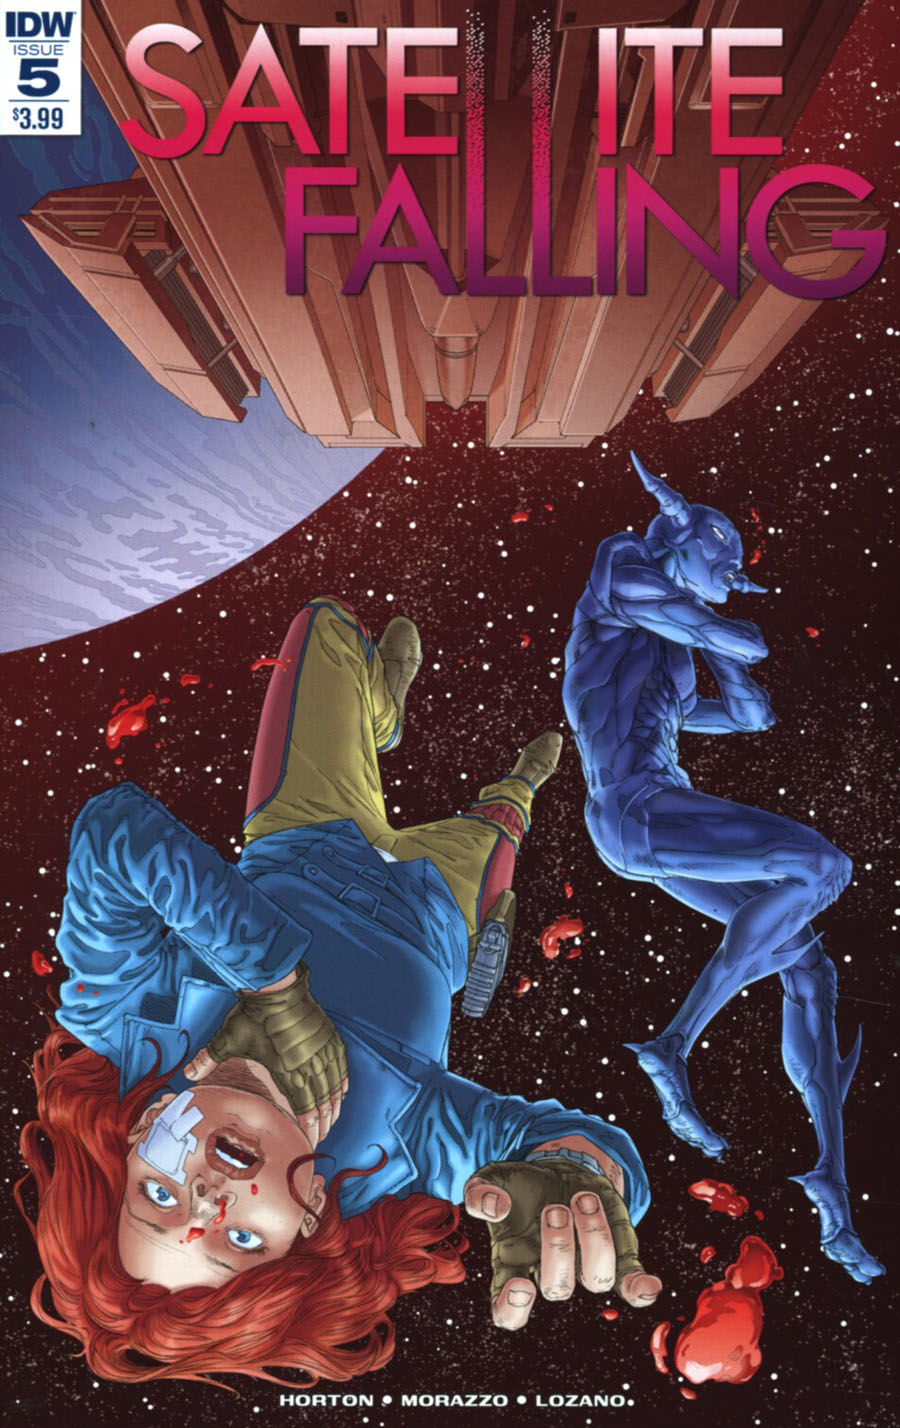 Satellite Falling #5 Cover A Regular Stephen Thompson Cover